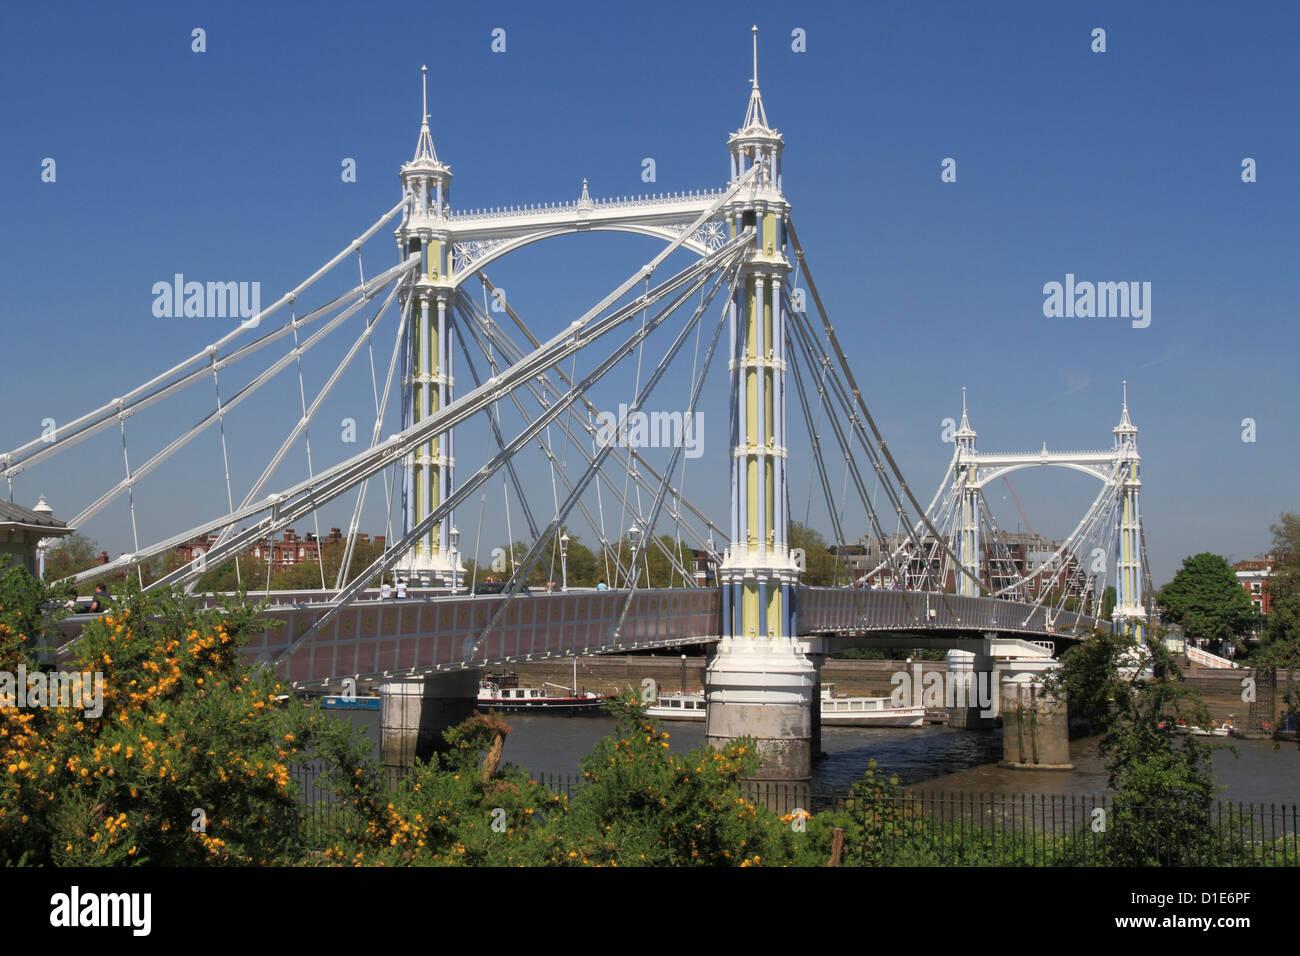 Albert Bridge over River Thames, Battersea, London, England, United Kingdom, Europe - Stock Image